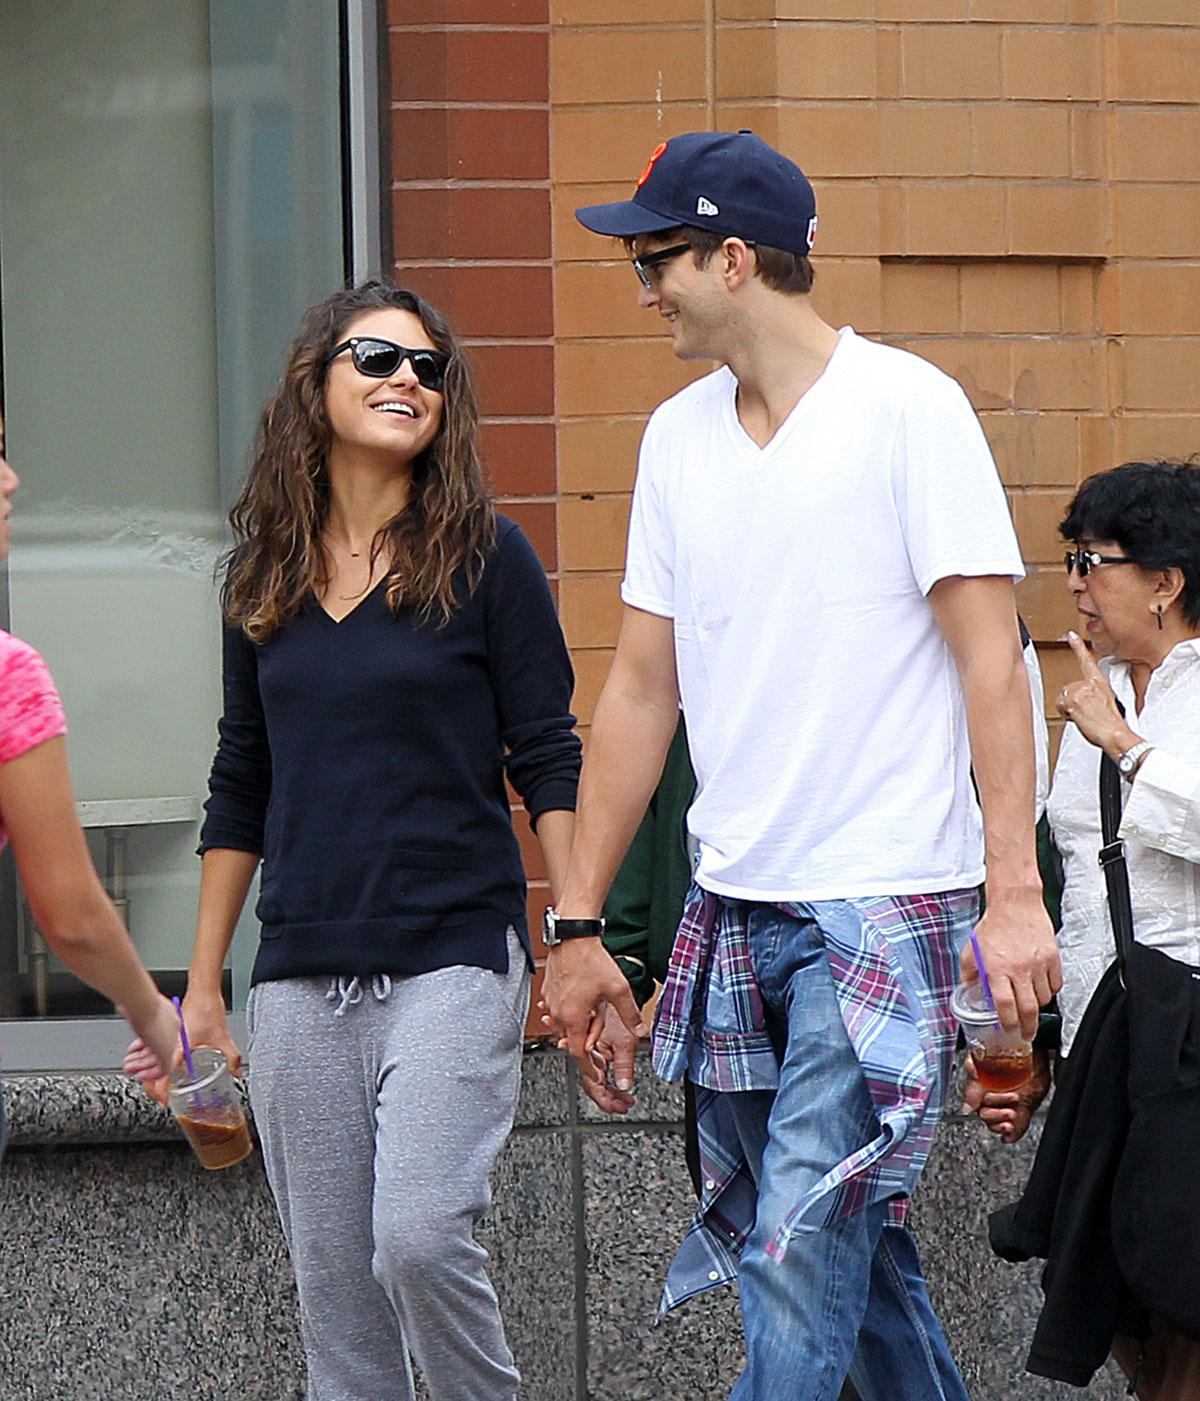 ashton kutcher dating mila kunis 2012 Mila kunis believes she has the world's greatest husband in spouse ashton kutcher they began dating in 2012.